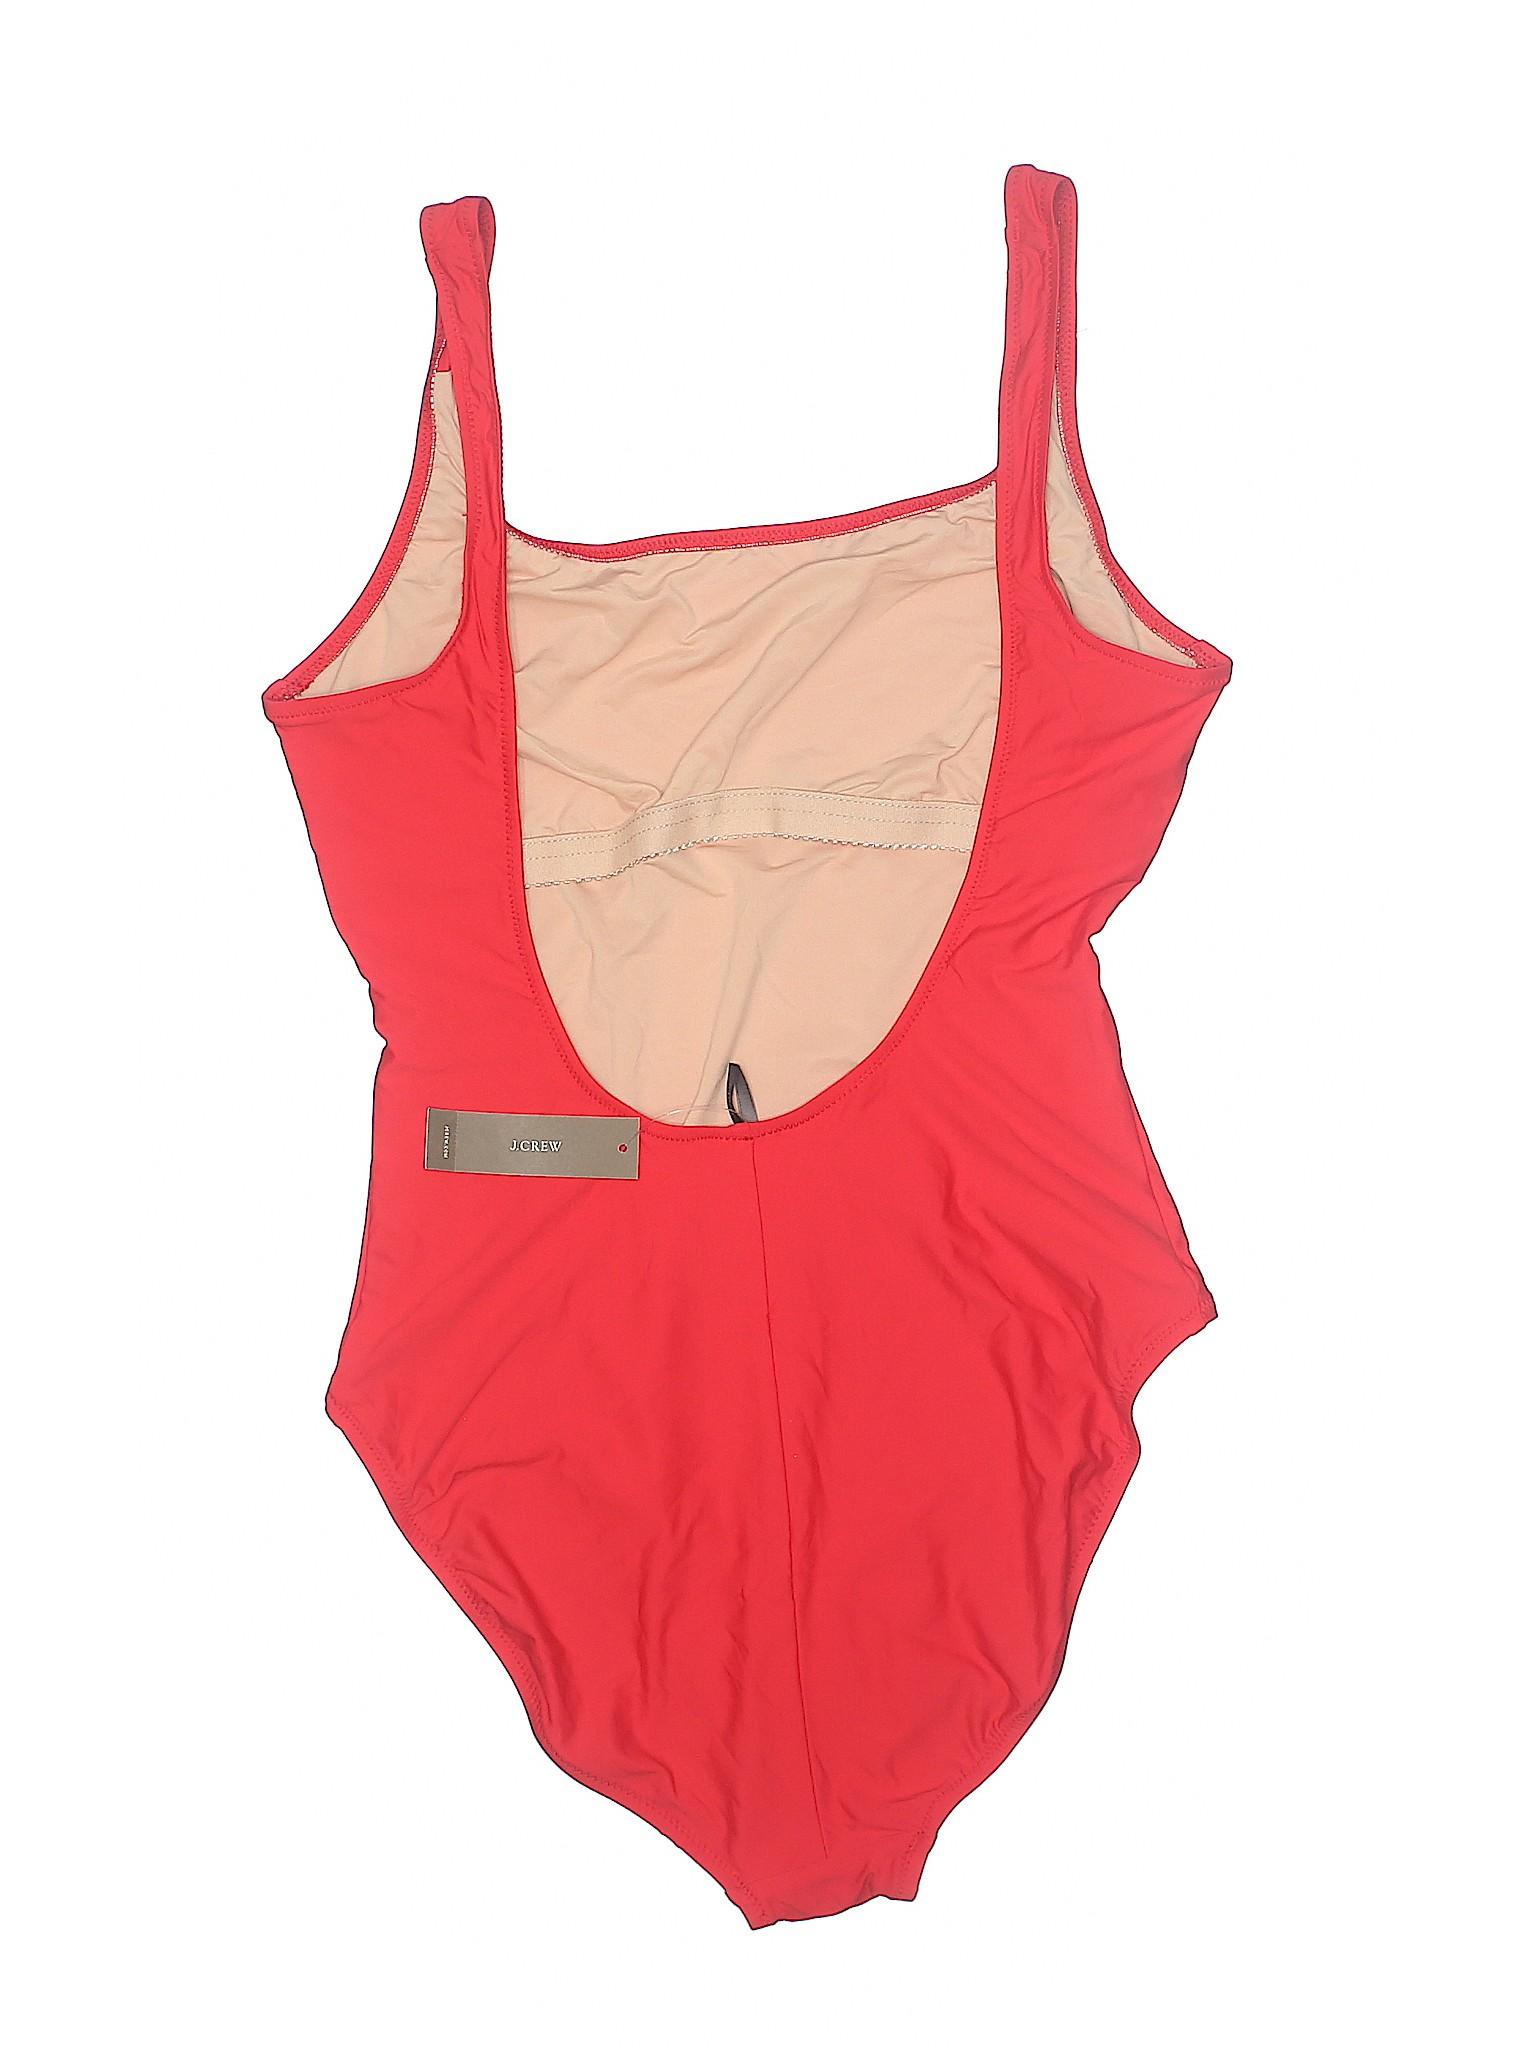 One J Crew Piece Swimsuit Boutique EFaq1nE